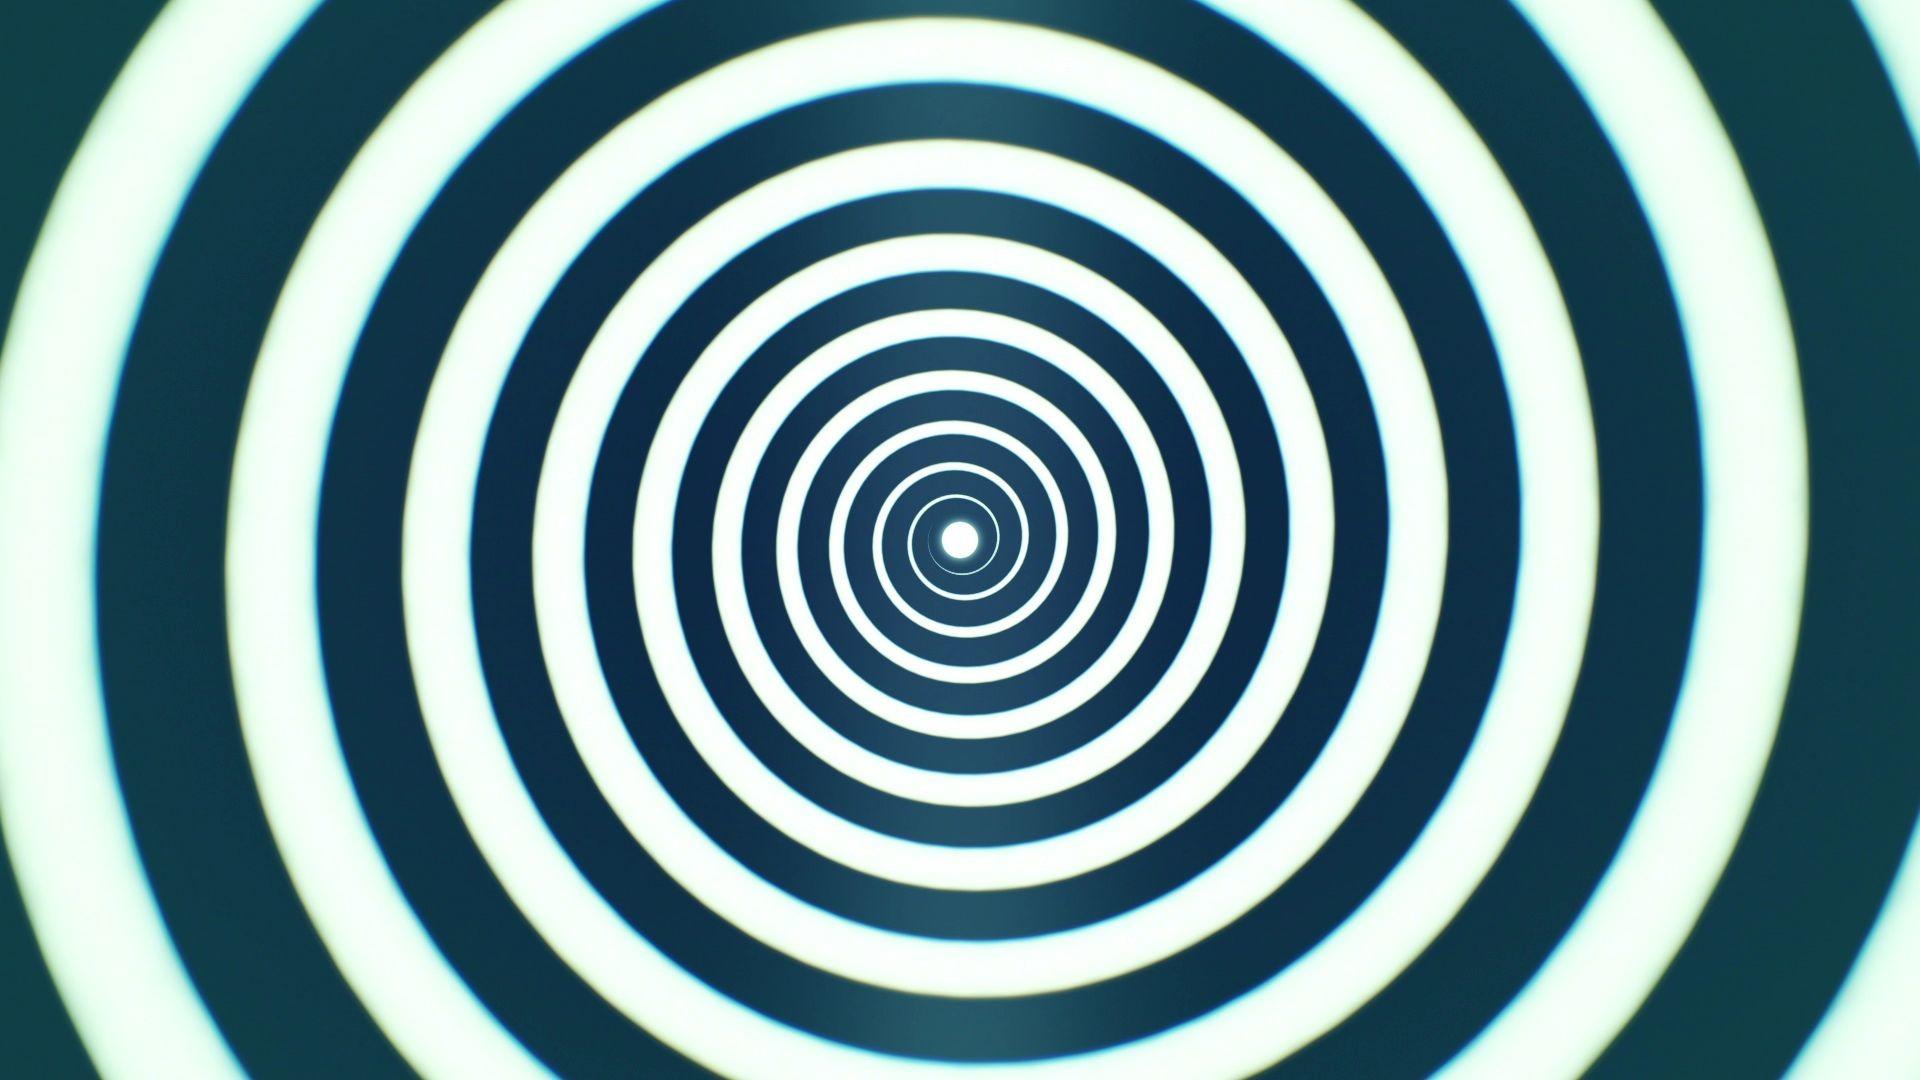 Hypnotic Wallpaper (70+ images)